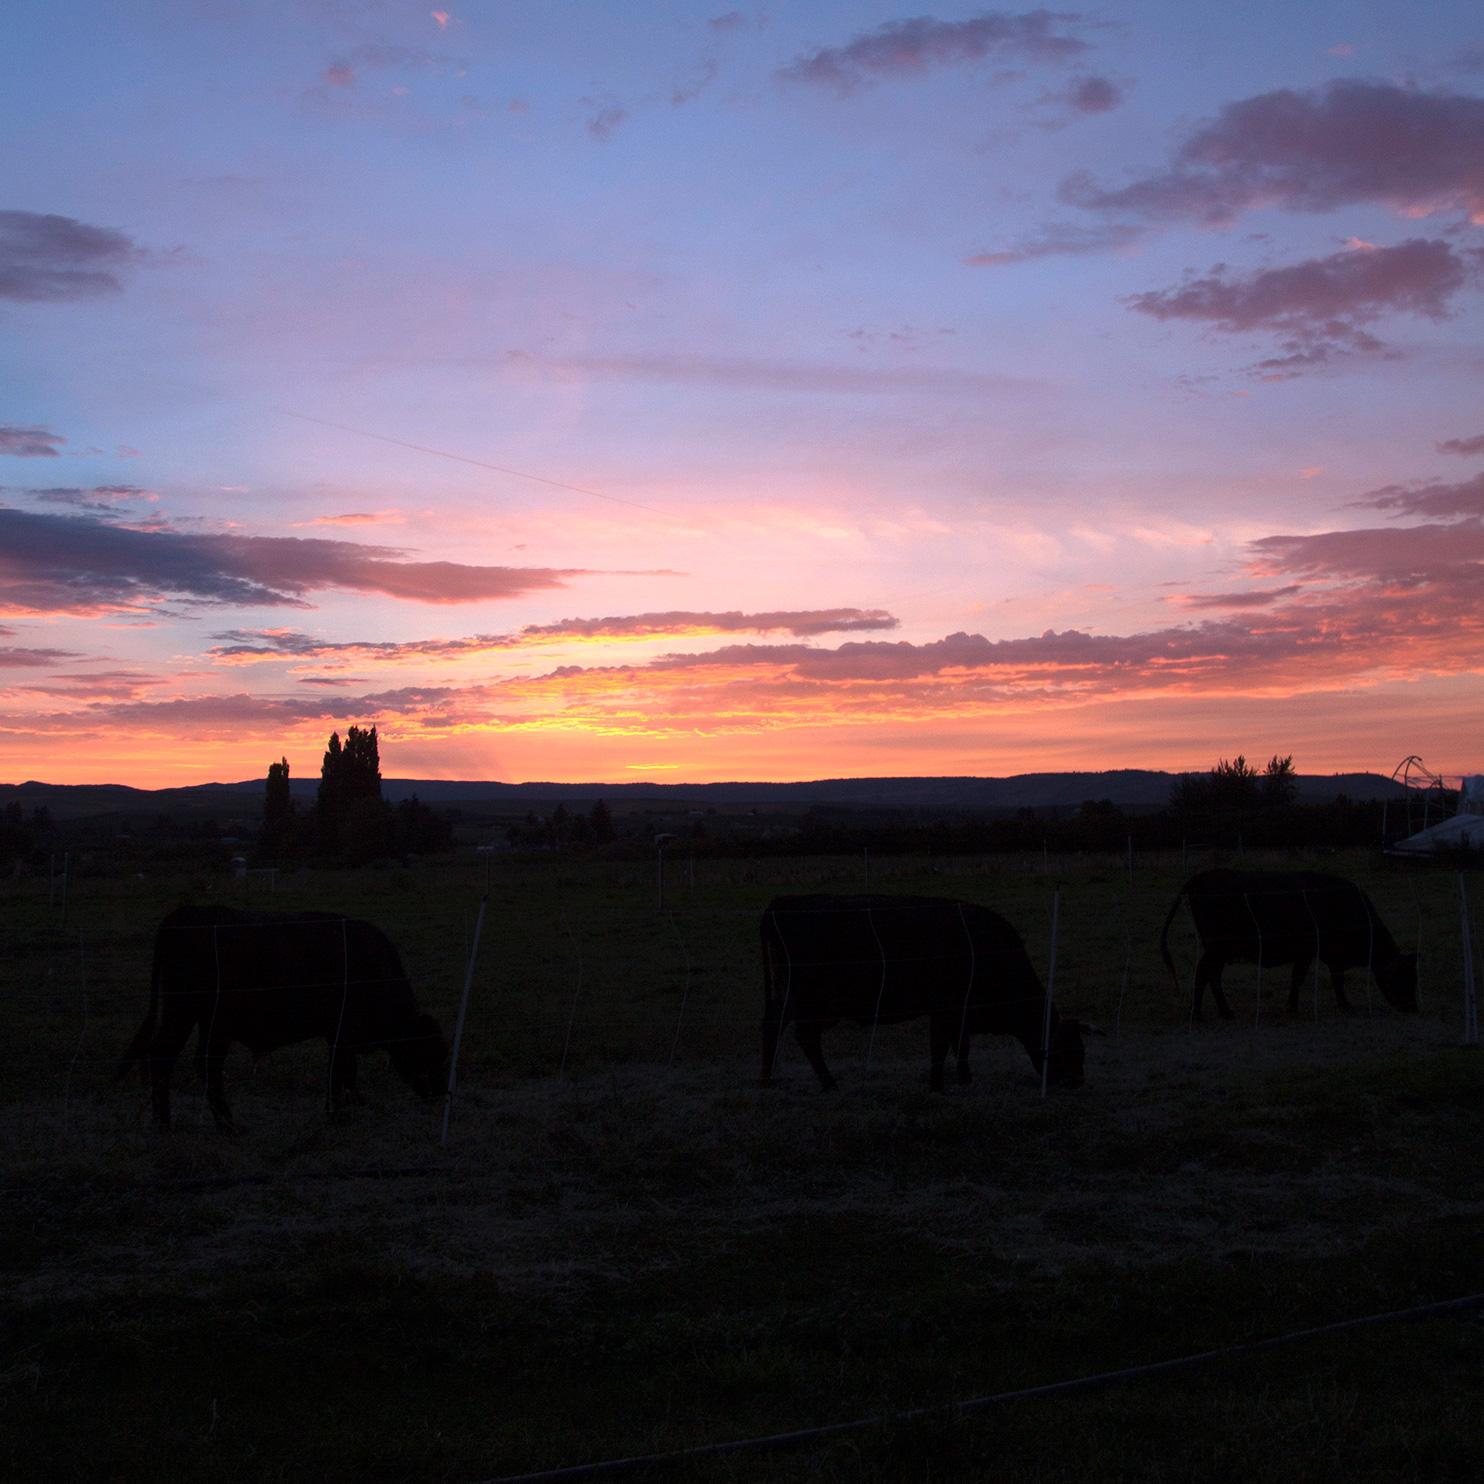 Square_sunset.jpg